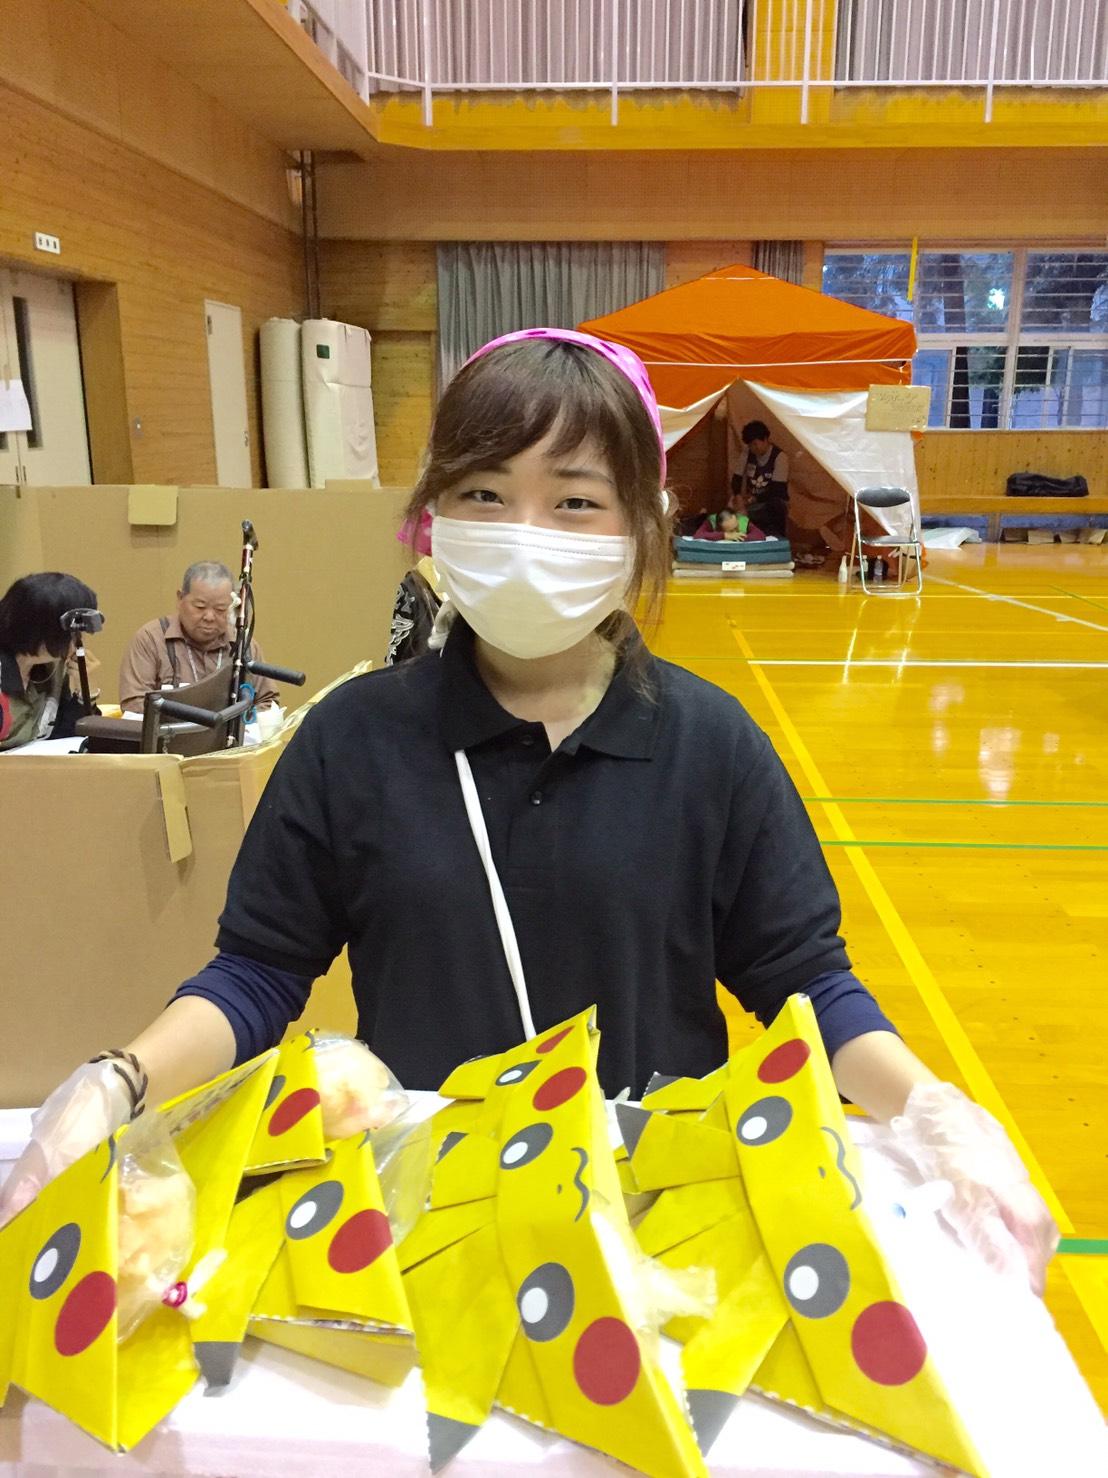 http://www.kickbackcafe.jp/support2/report/S__5202021.jpg